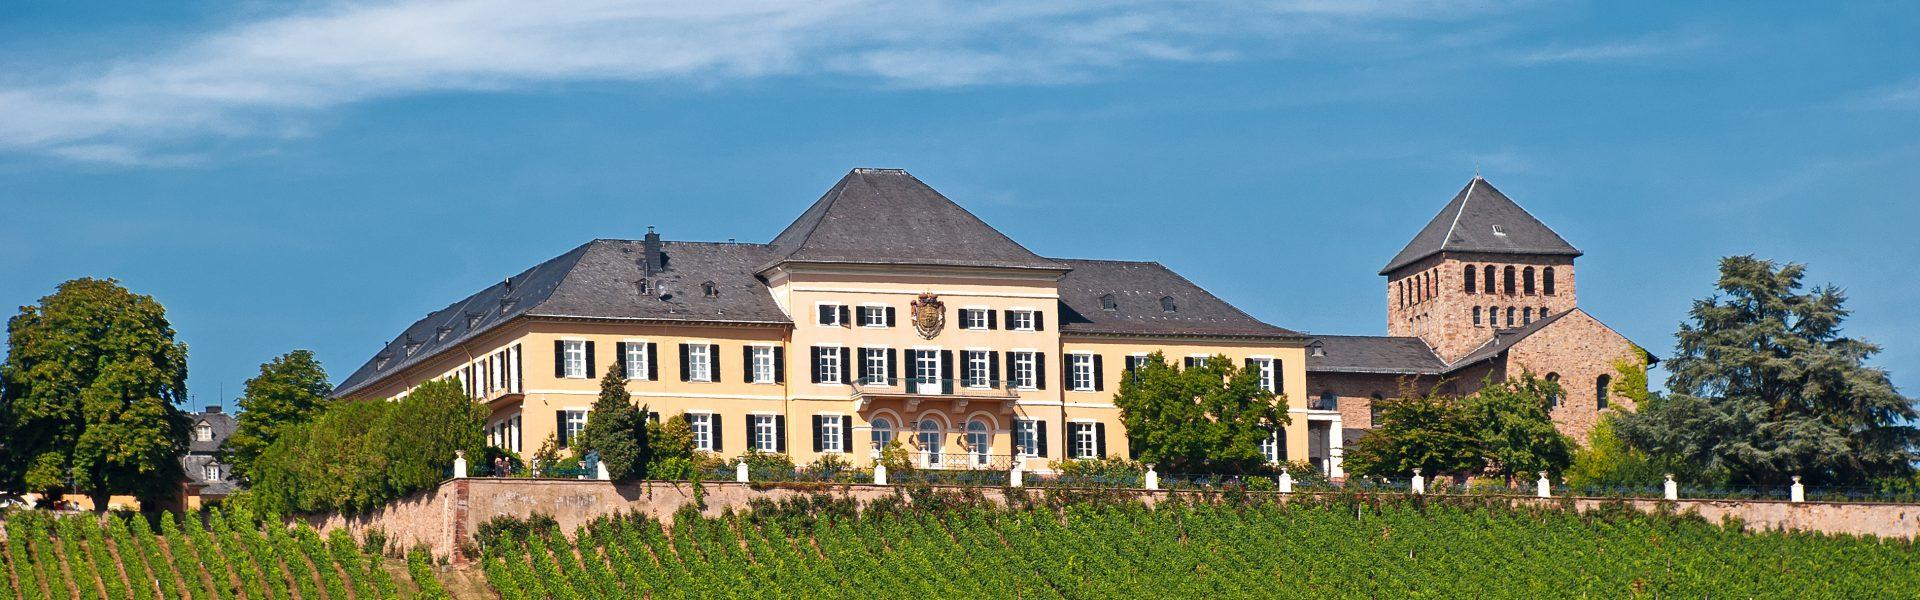 Immobilienmakler • Rheingau • Mainz • Wiesbaden - Mills Immobilien